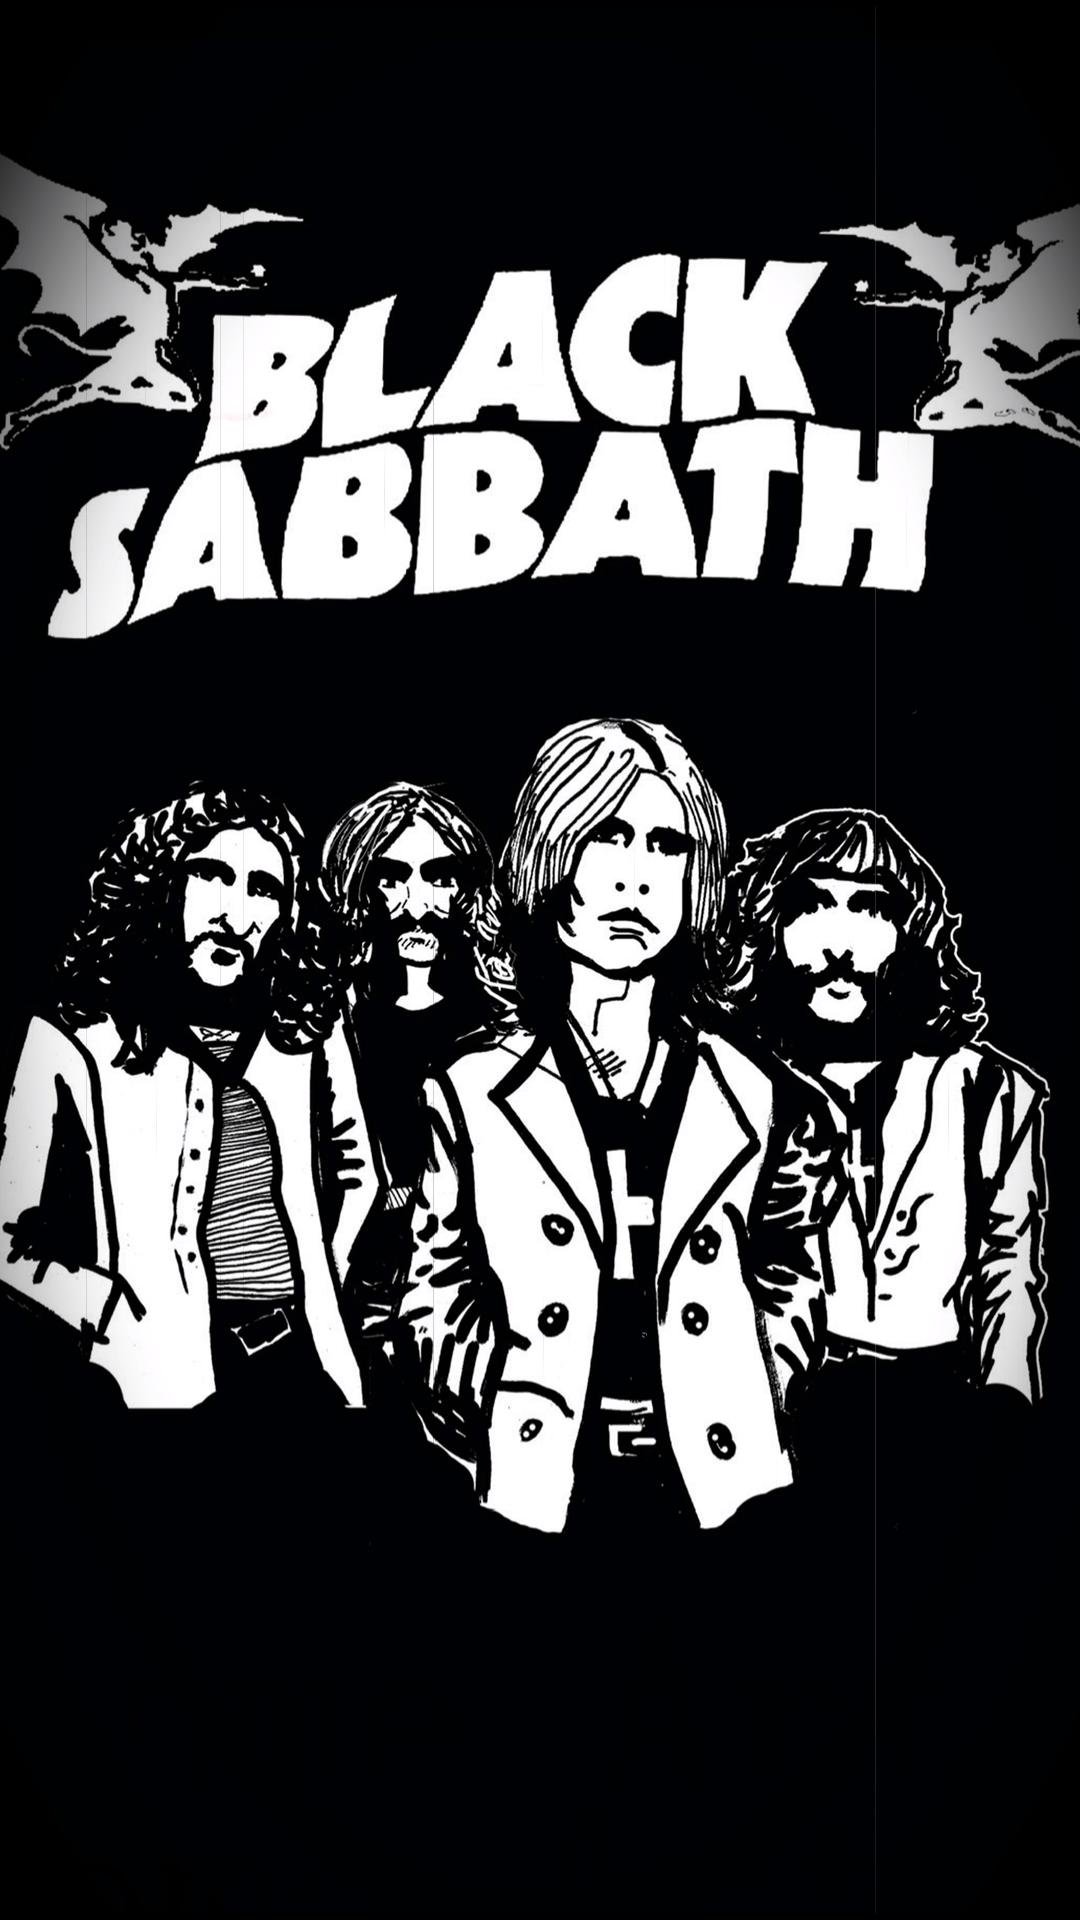 Black Sabbath piano sheet music